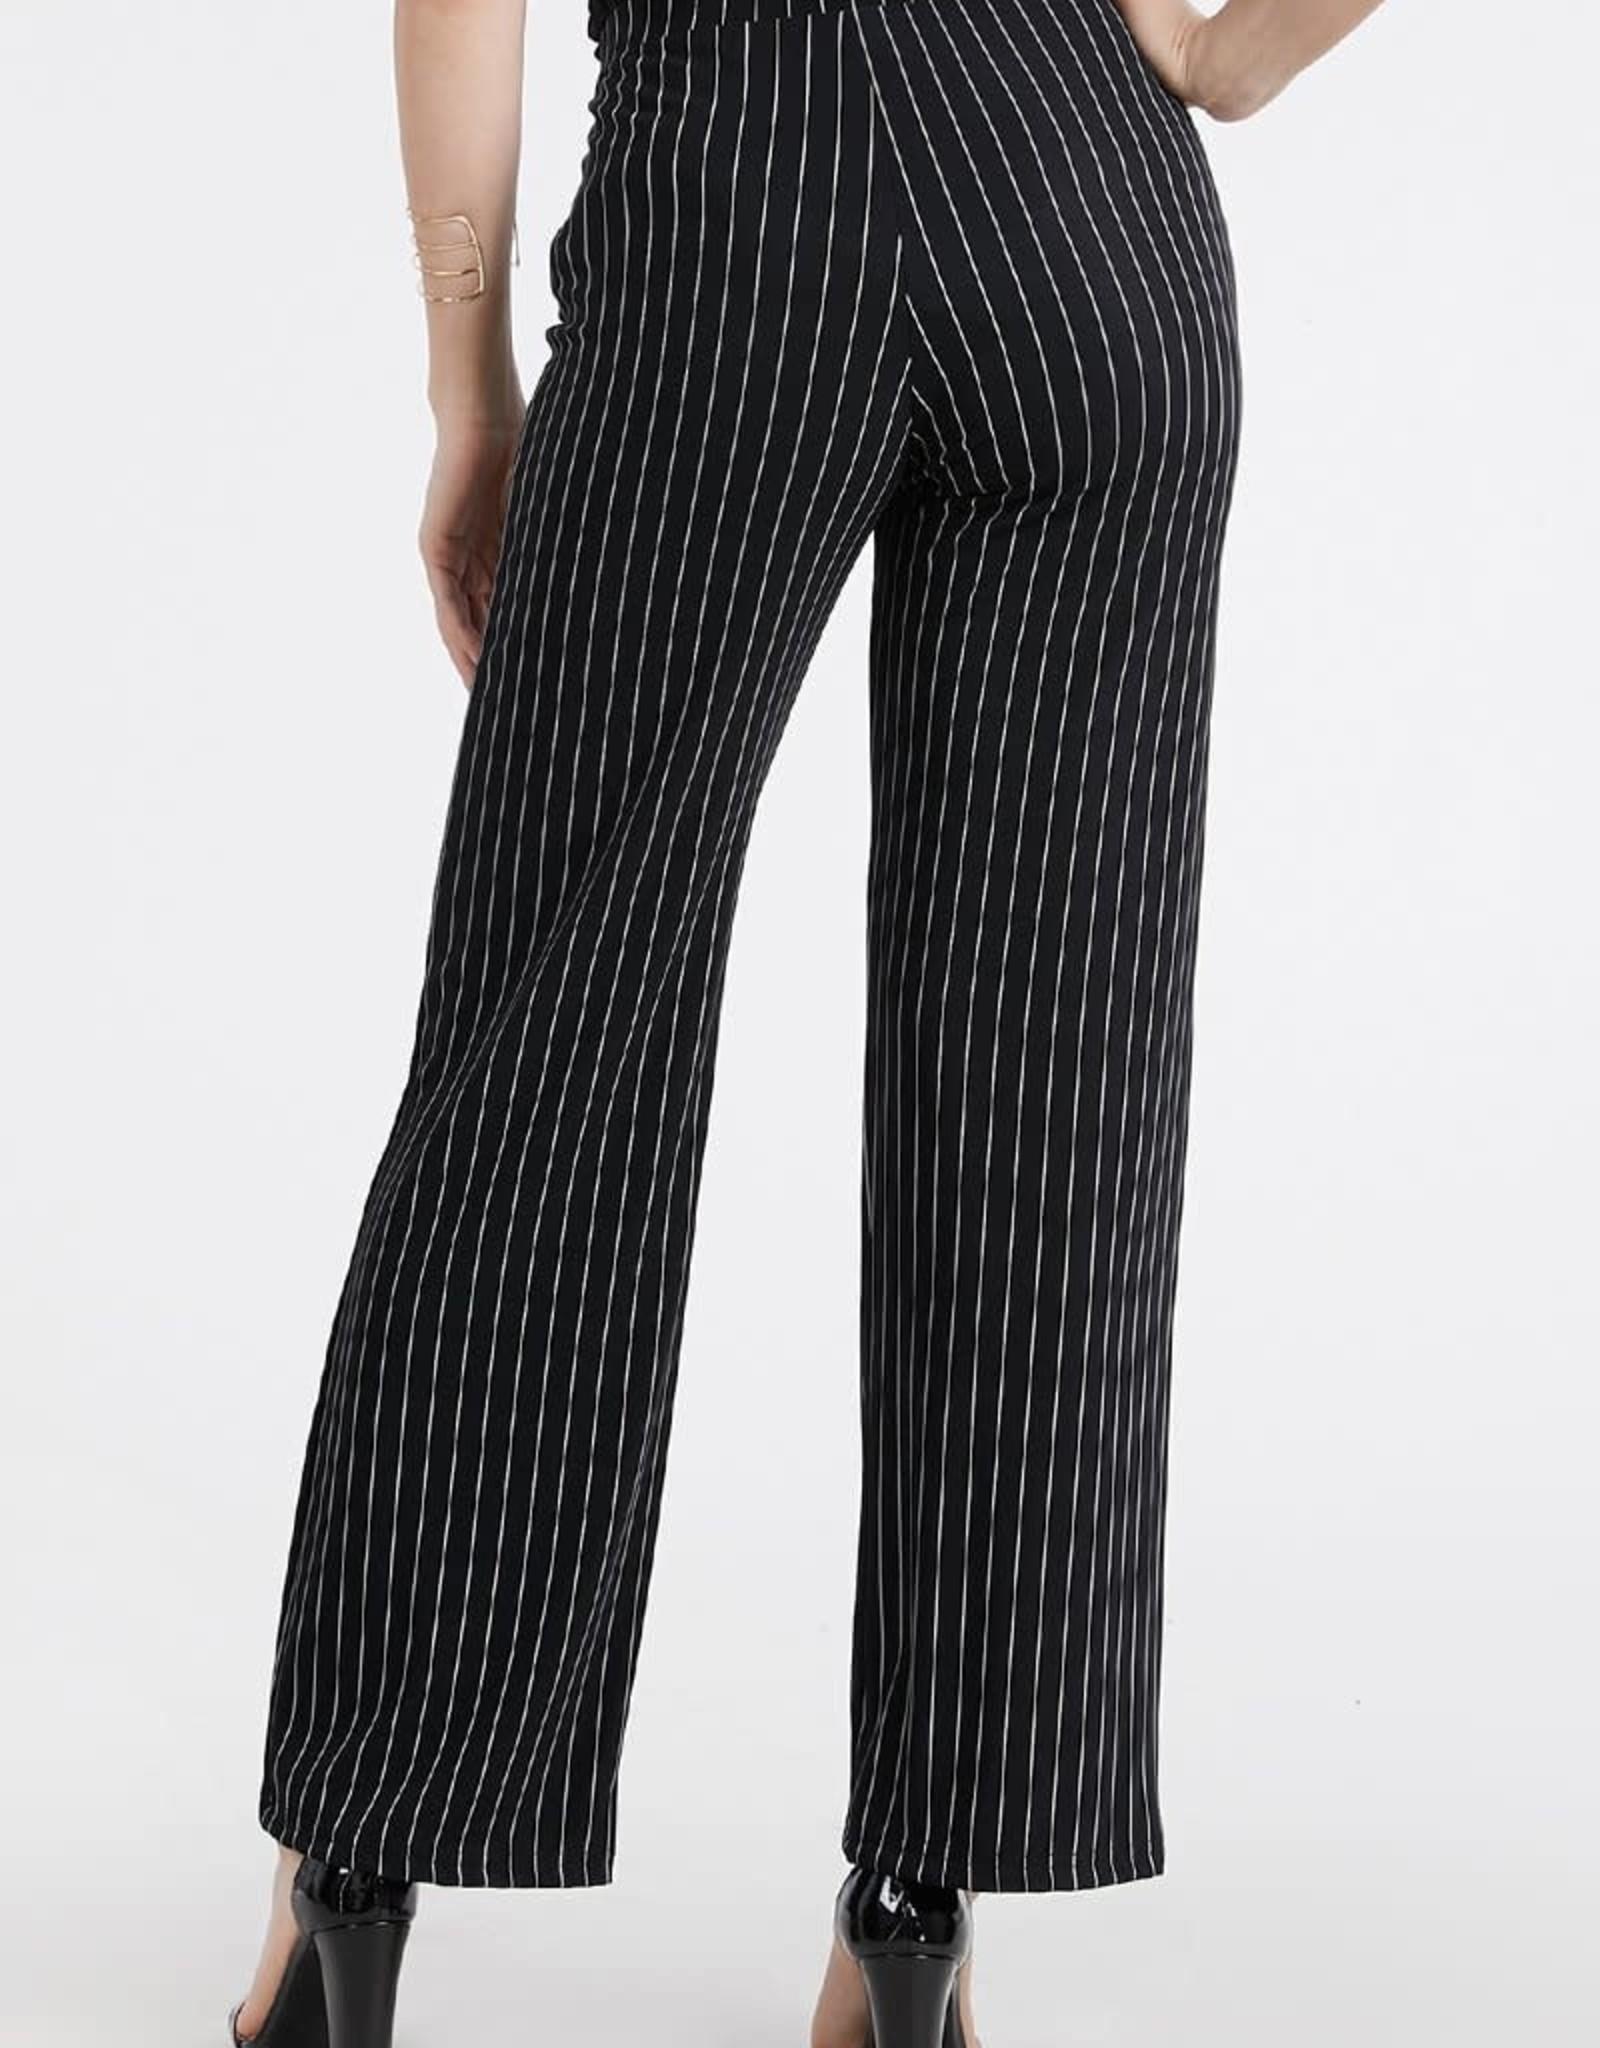 - Black/White Stripe Straight Leg Pant